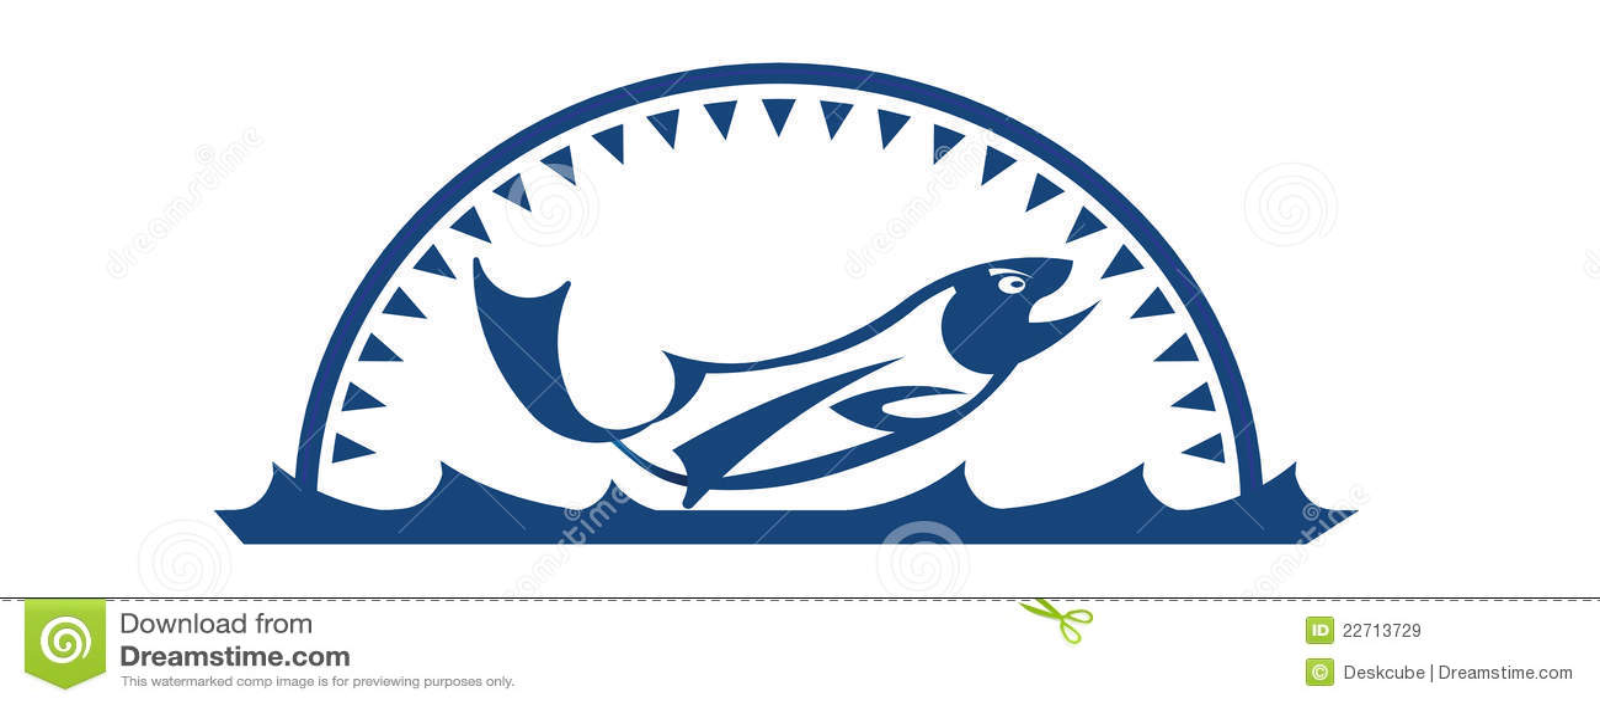 Fishing logo design - photo#22